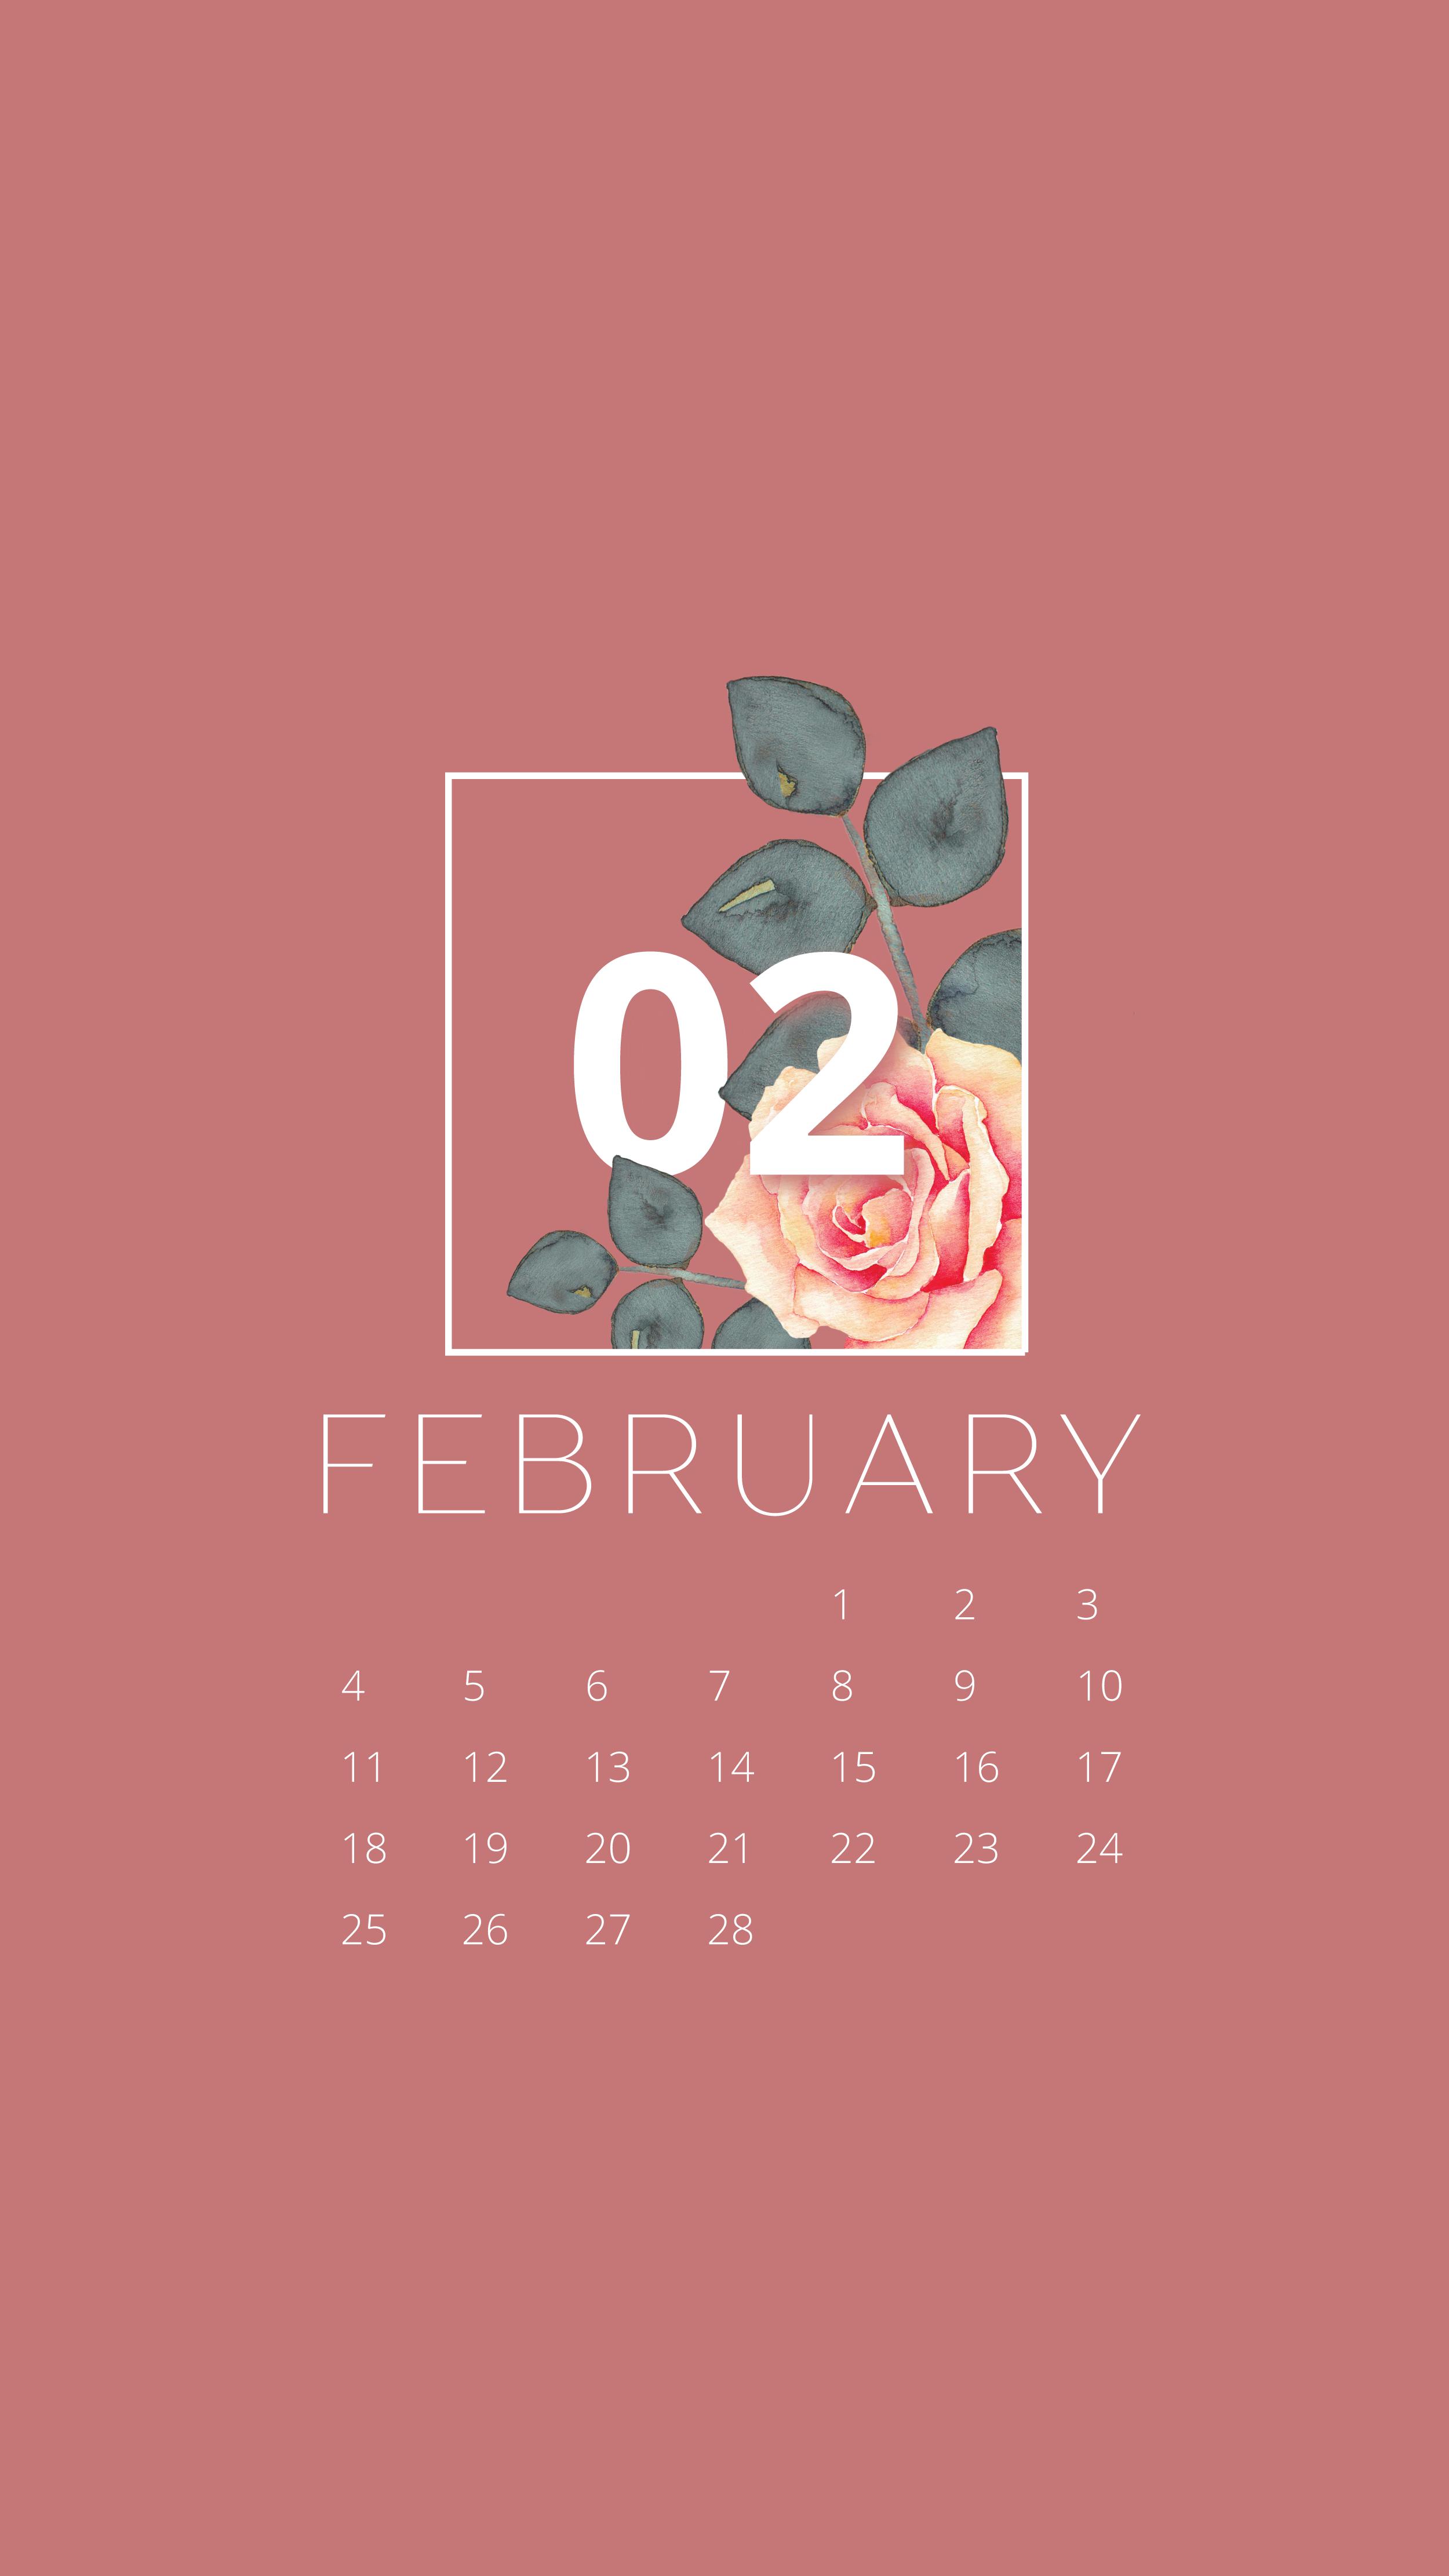 Free February 2018 Desktop & iPhone Wallpaper free